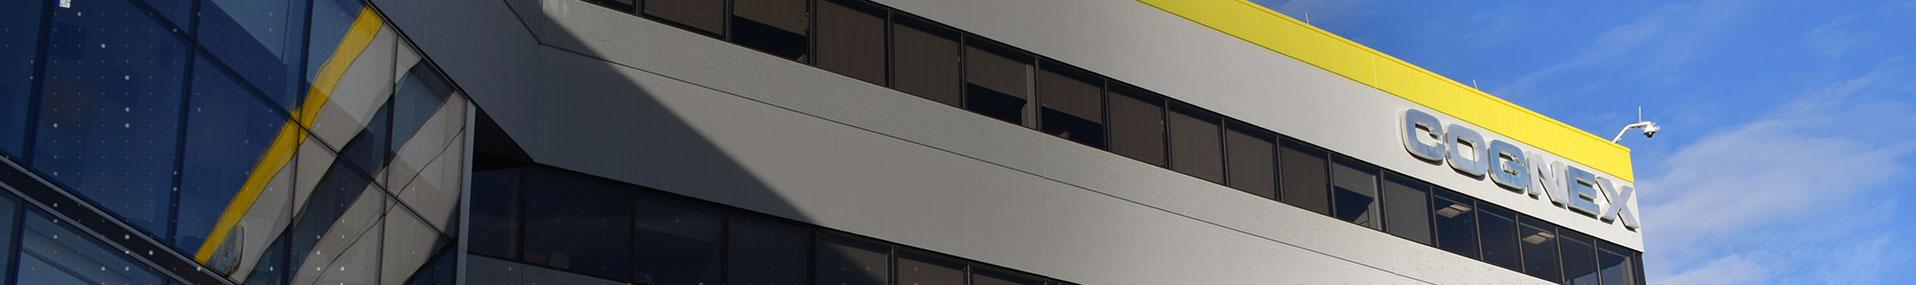 Cognex Company Logo on Building